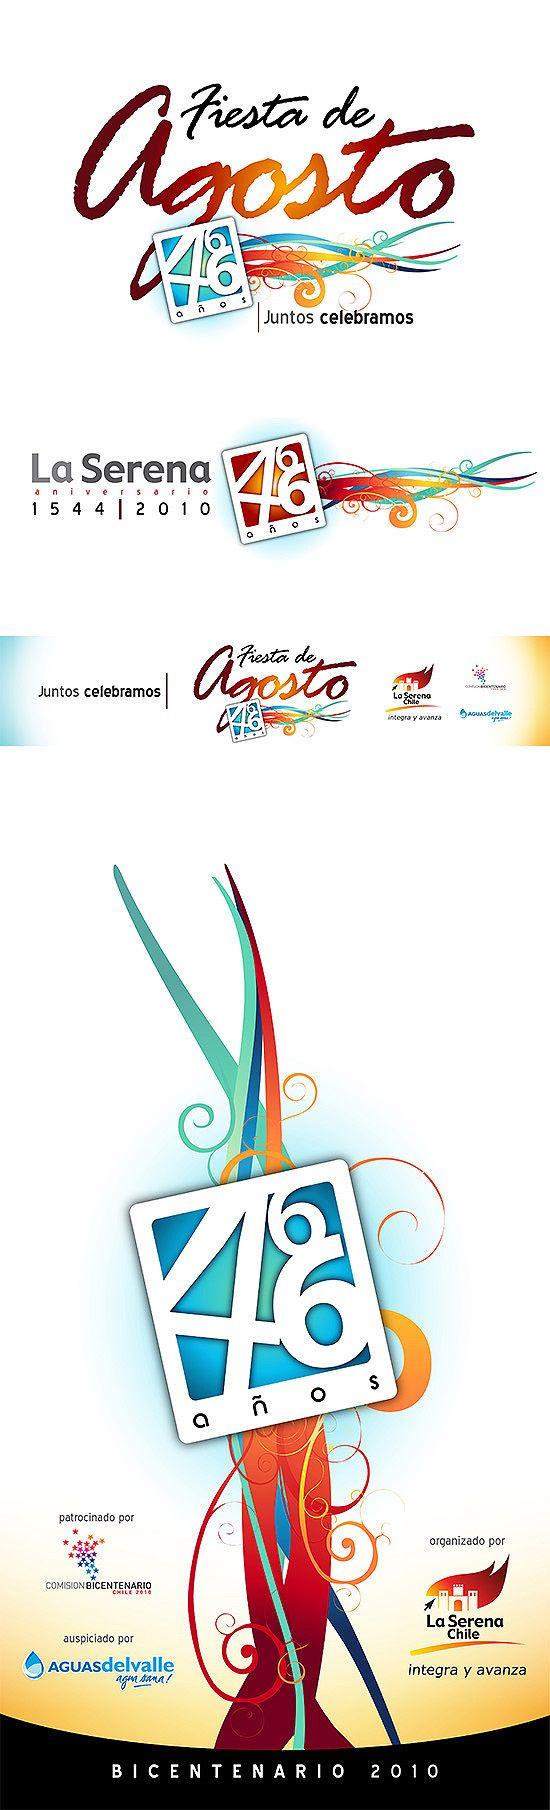 2010 / Fiesta de Agosto on Behance